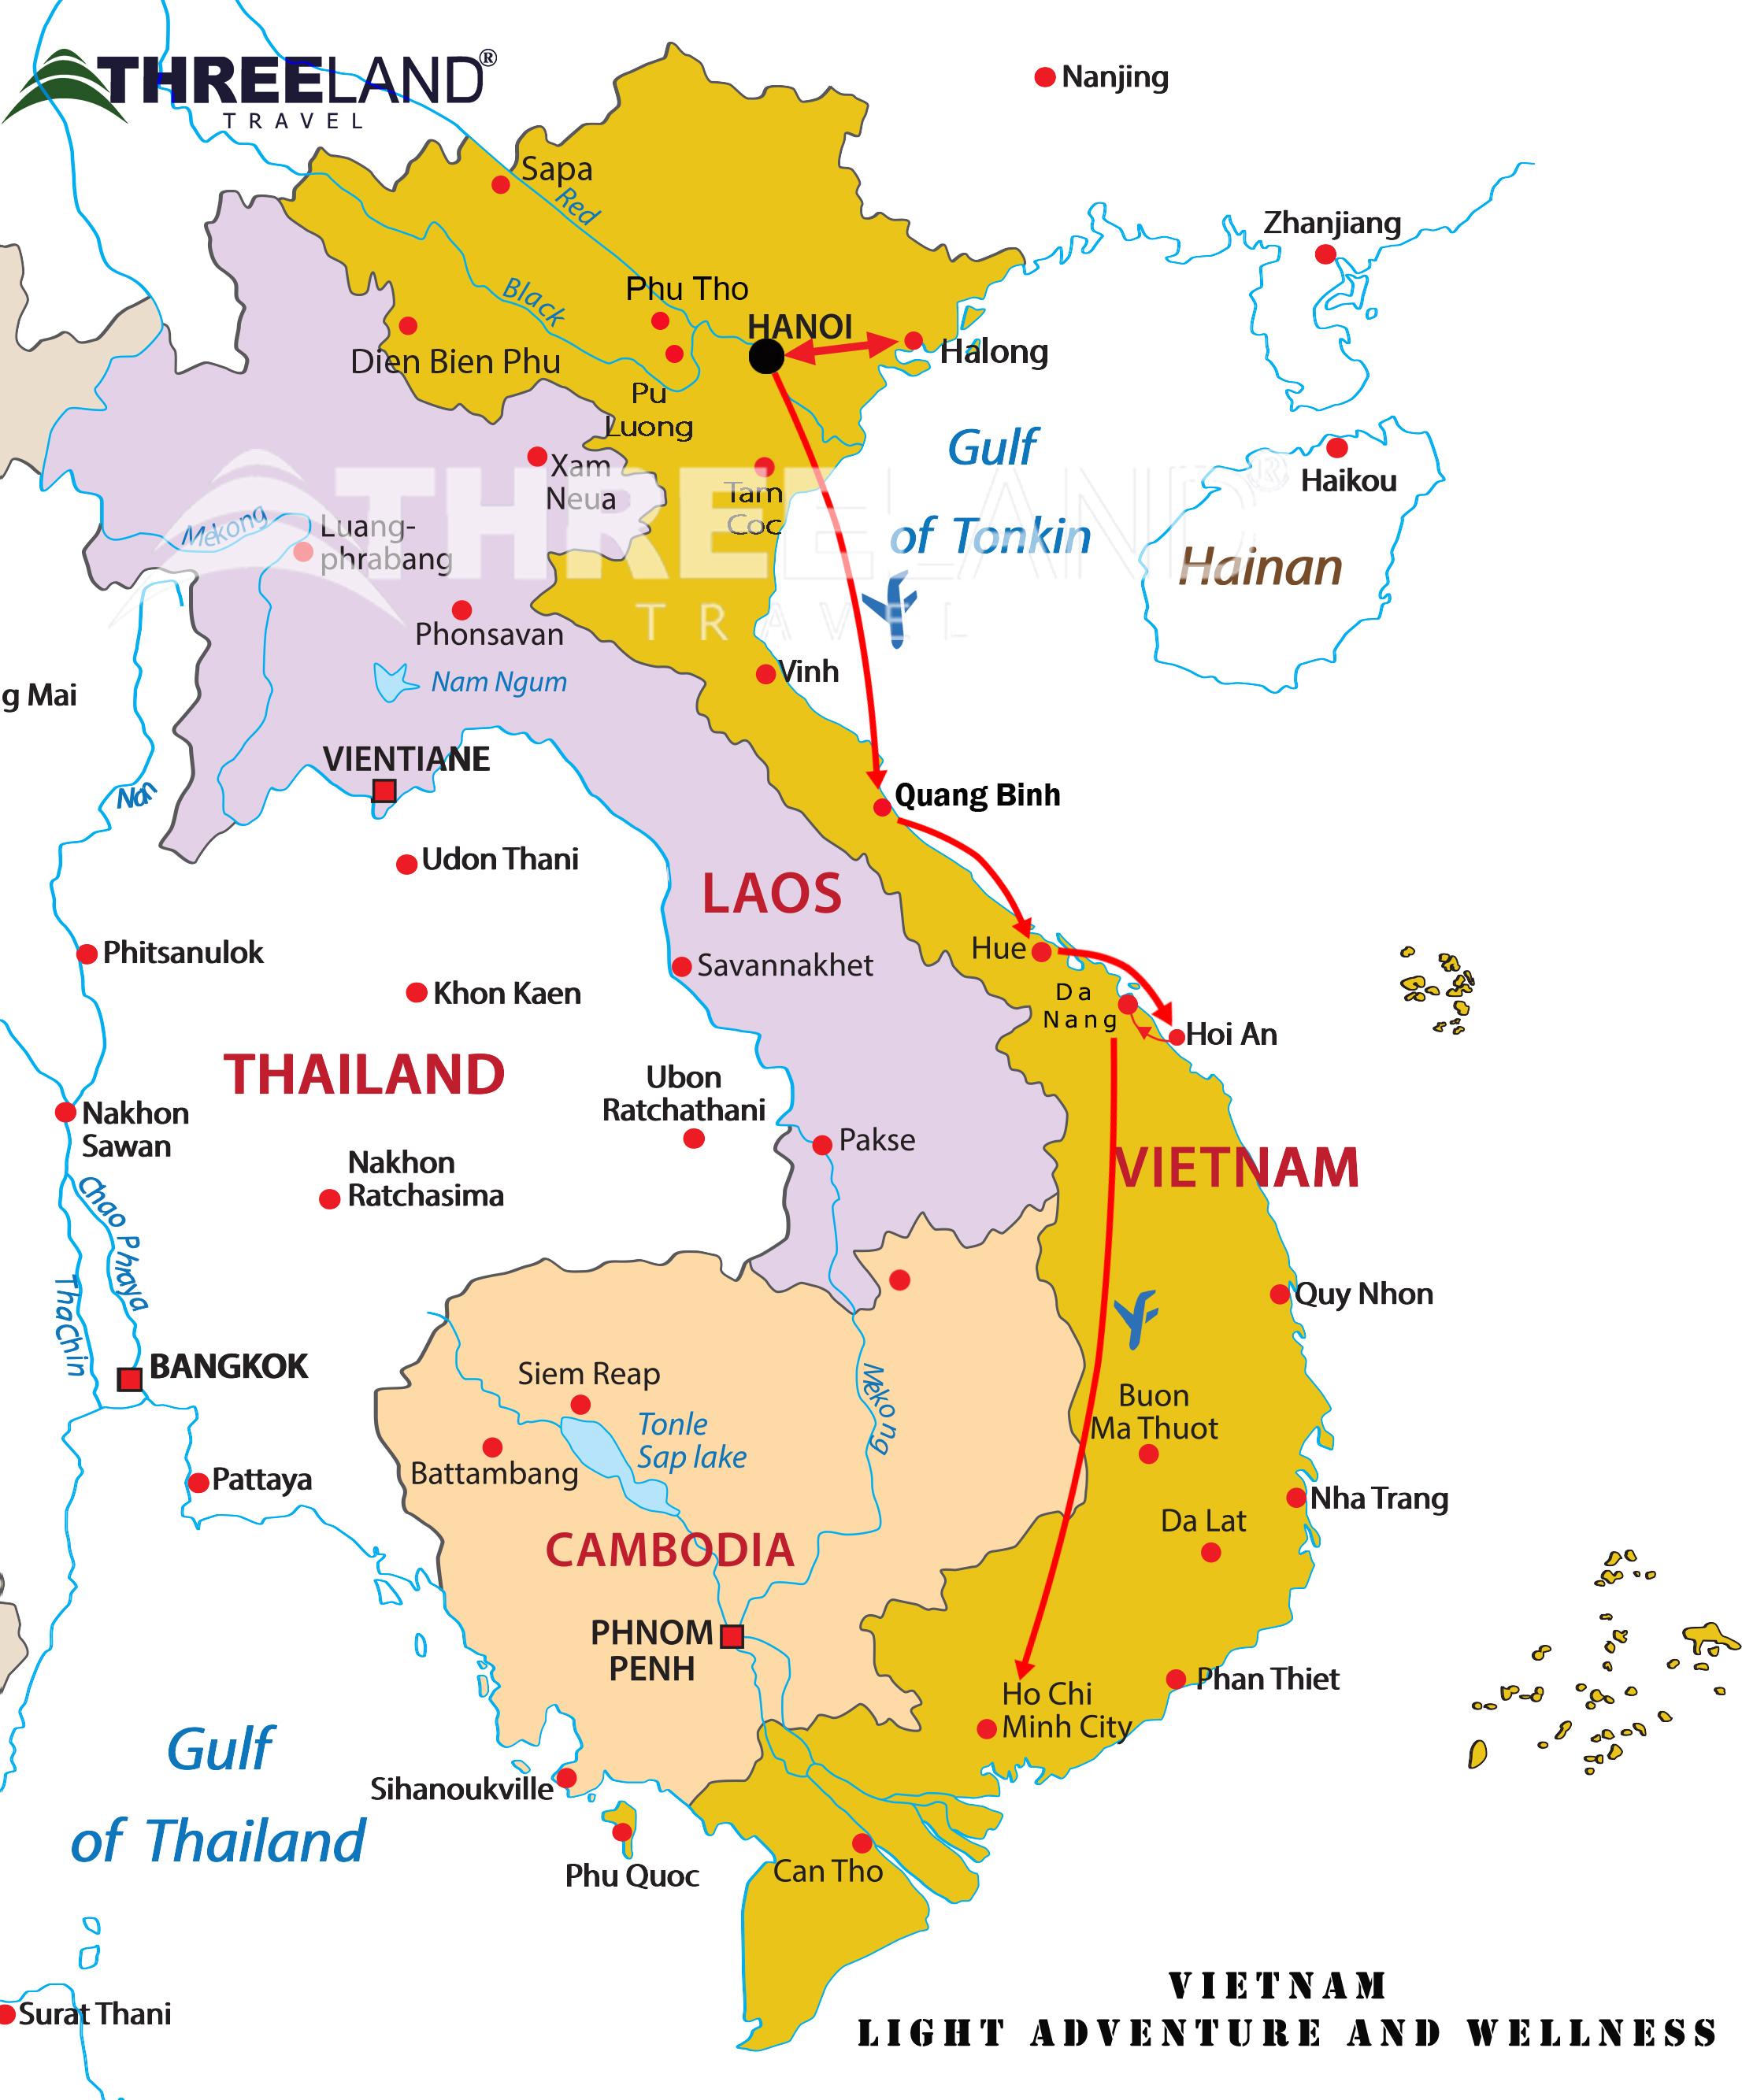 Vietnam Light Adventure and Wellness